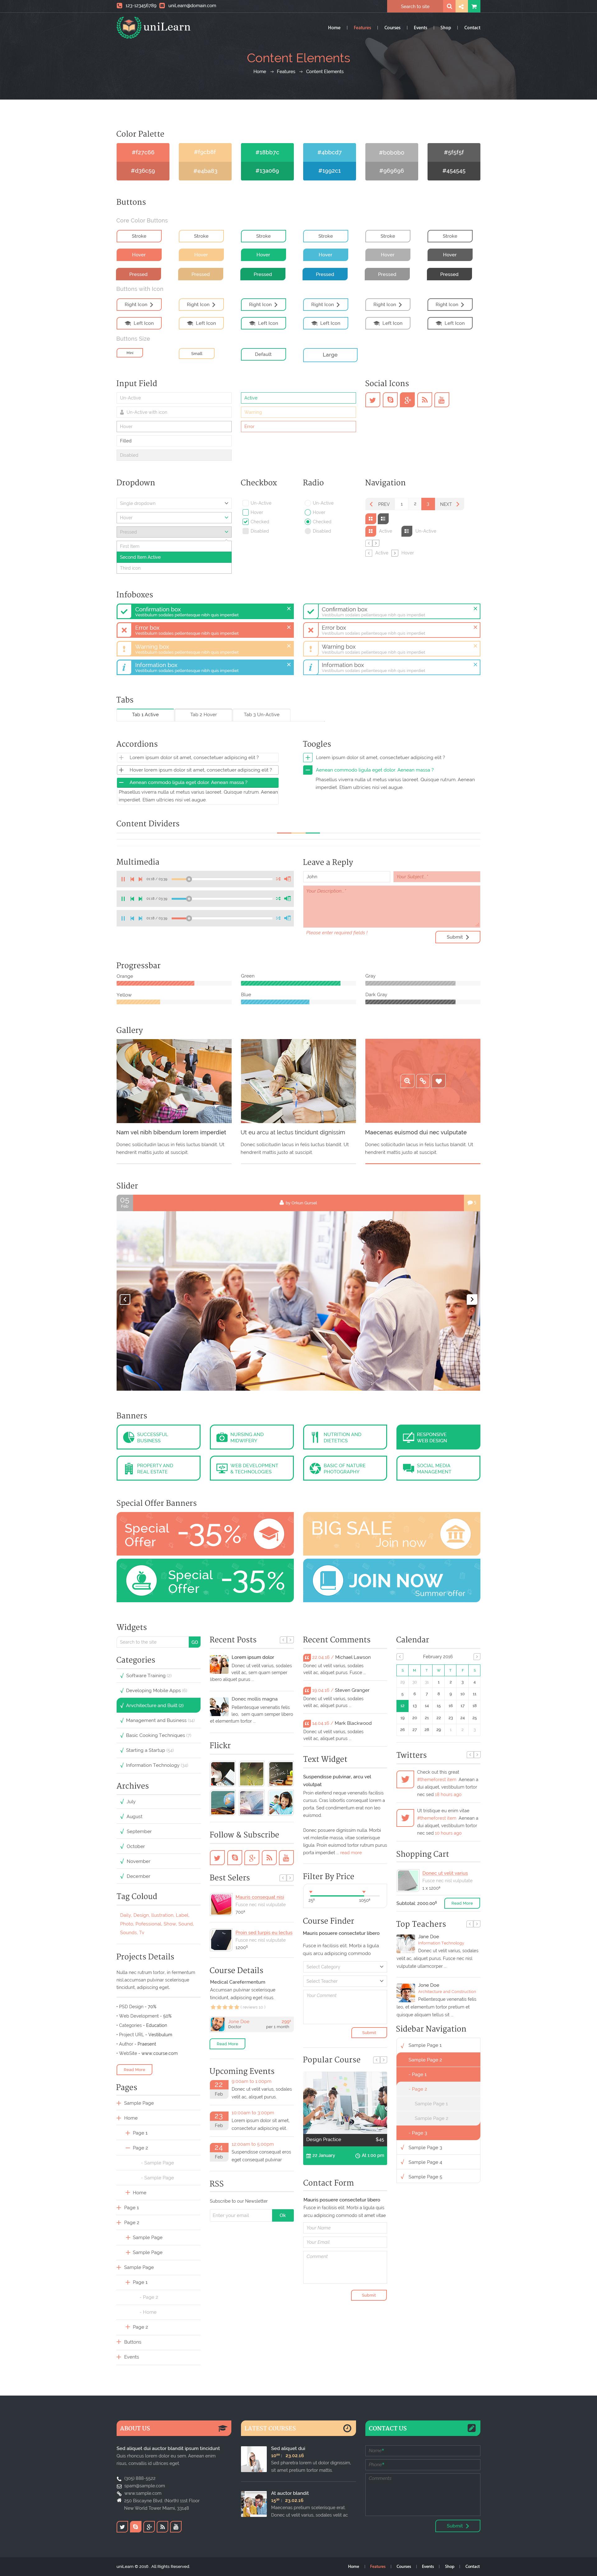 17 features pages content elements